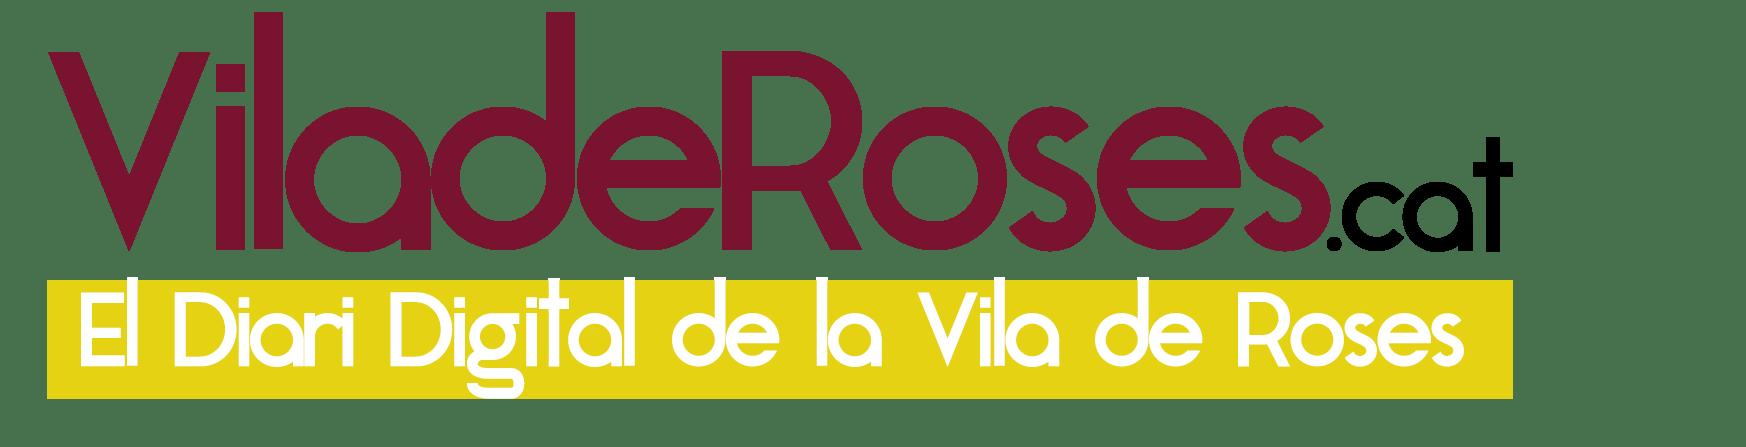 Diari digital Vila de Roses